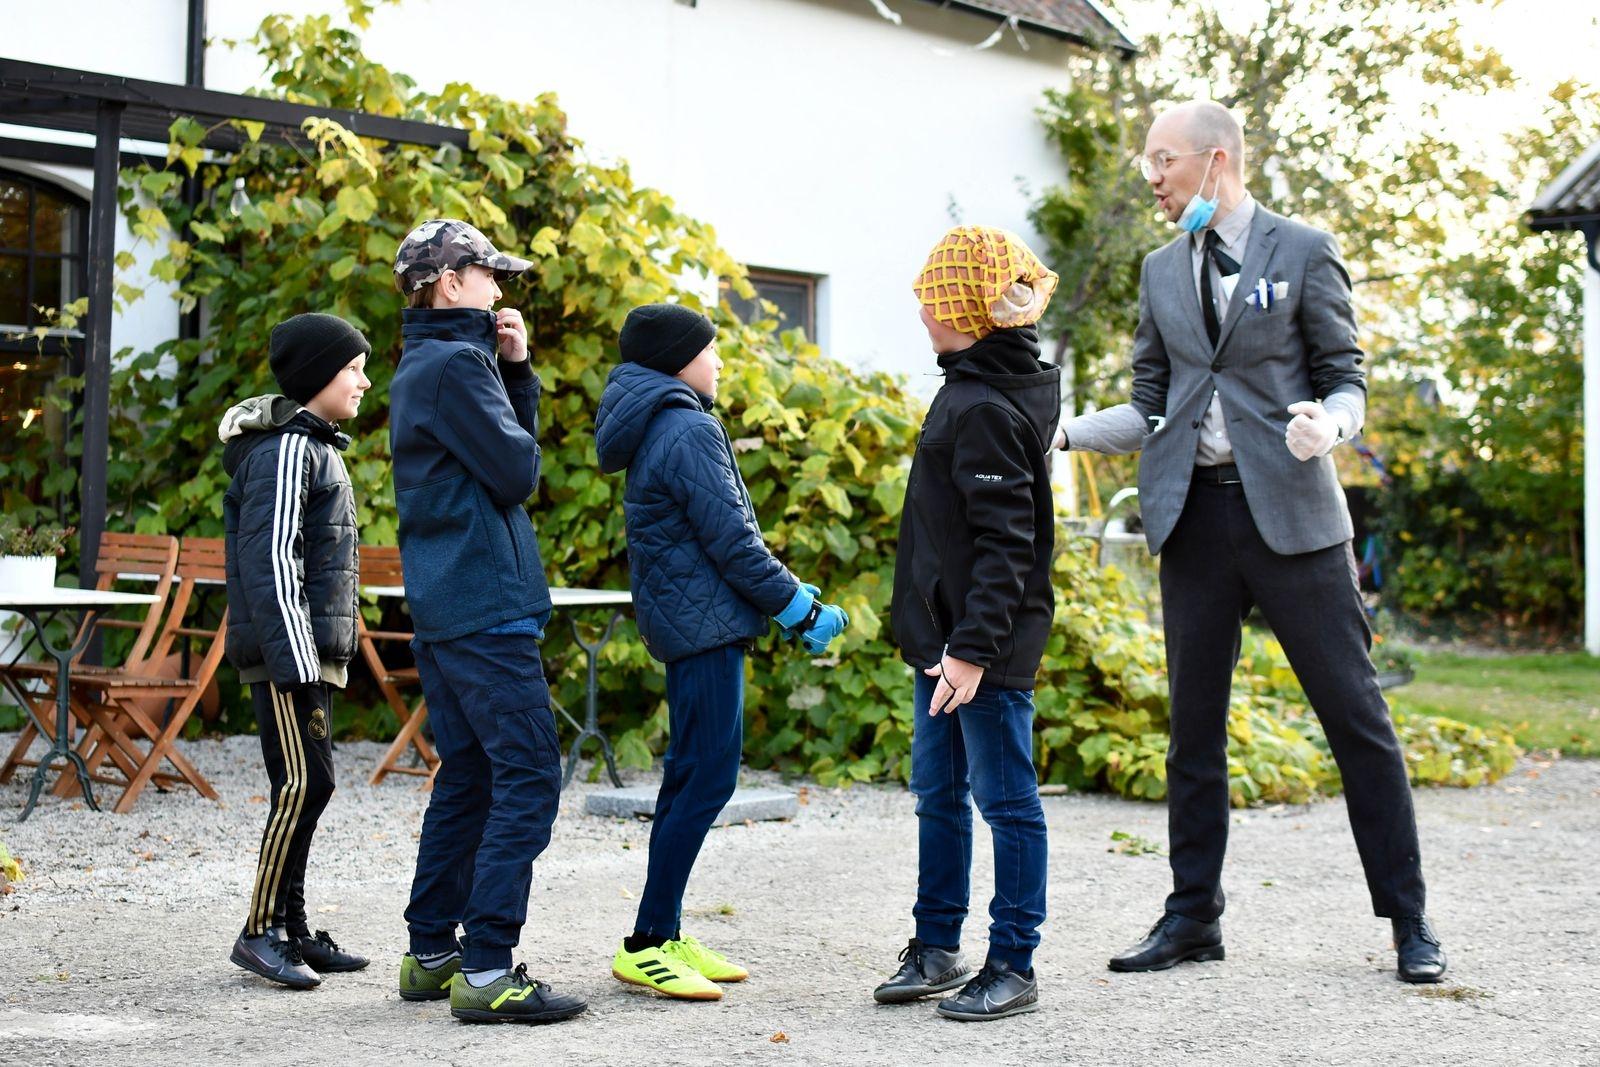 Nils Peder Holm, som driver Skillinge teater tillsammans med Karin Johansson-Mex, mötte eleverna i rollen som entreprenören Yngve.